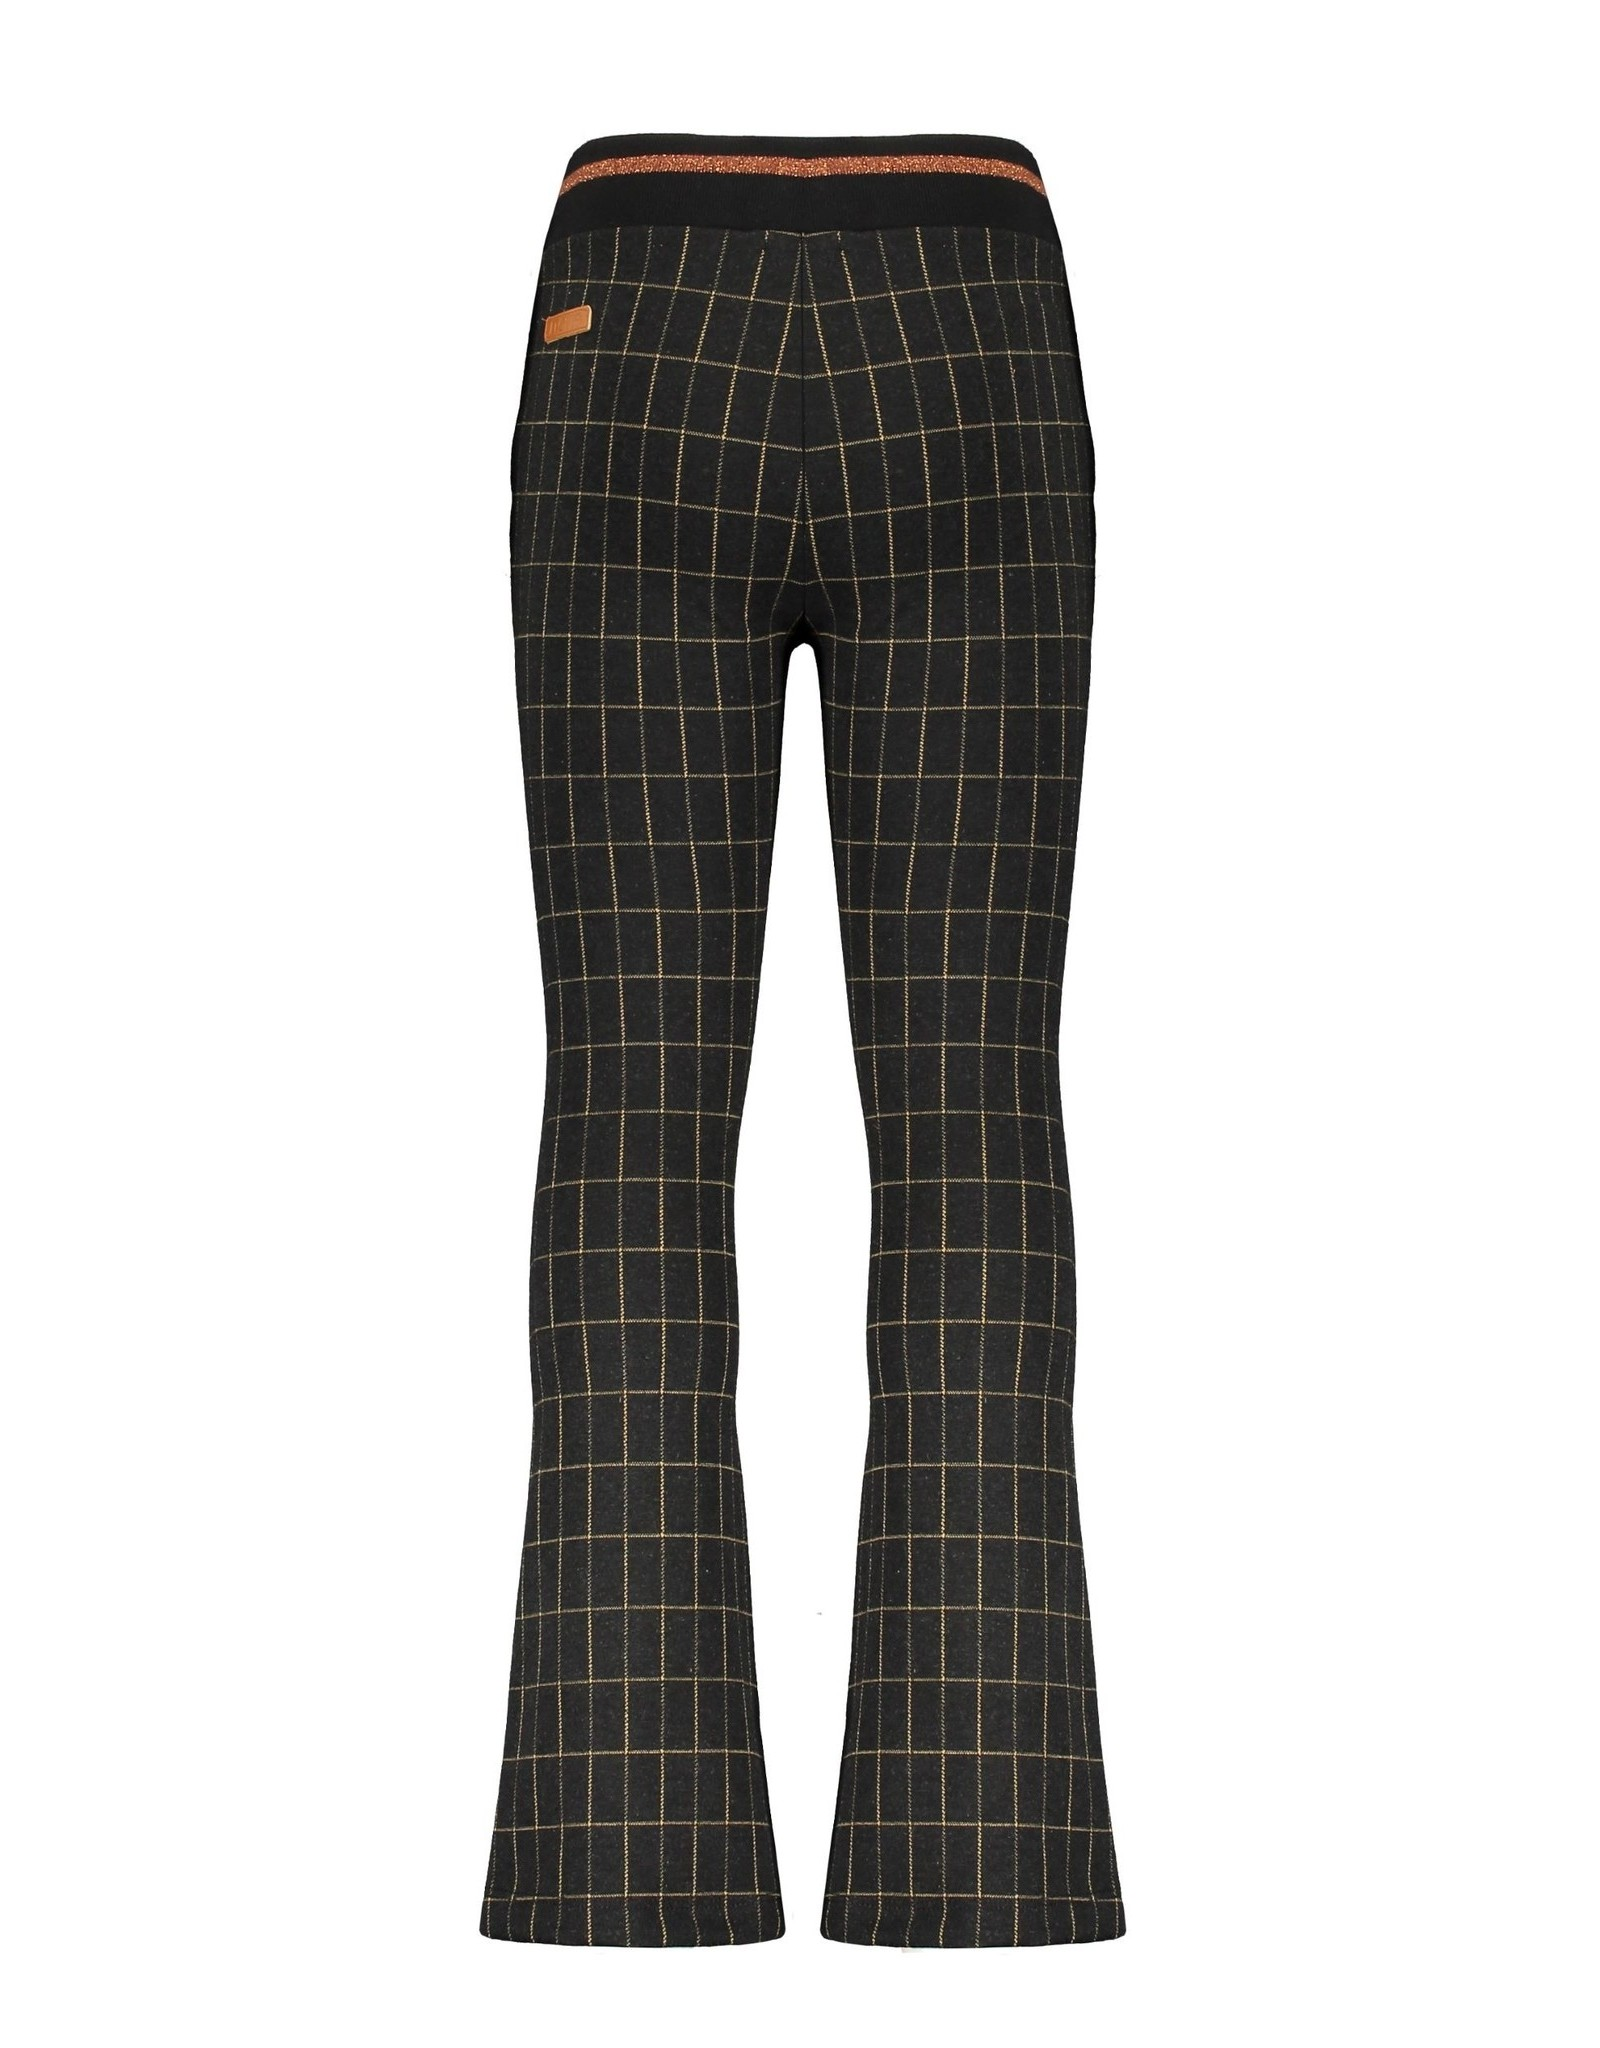 Nono NONO flared pants 5609 jet black